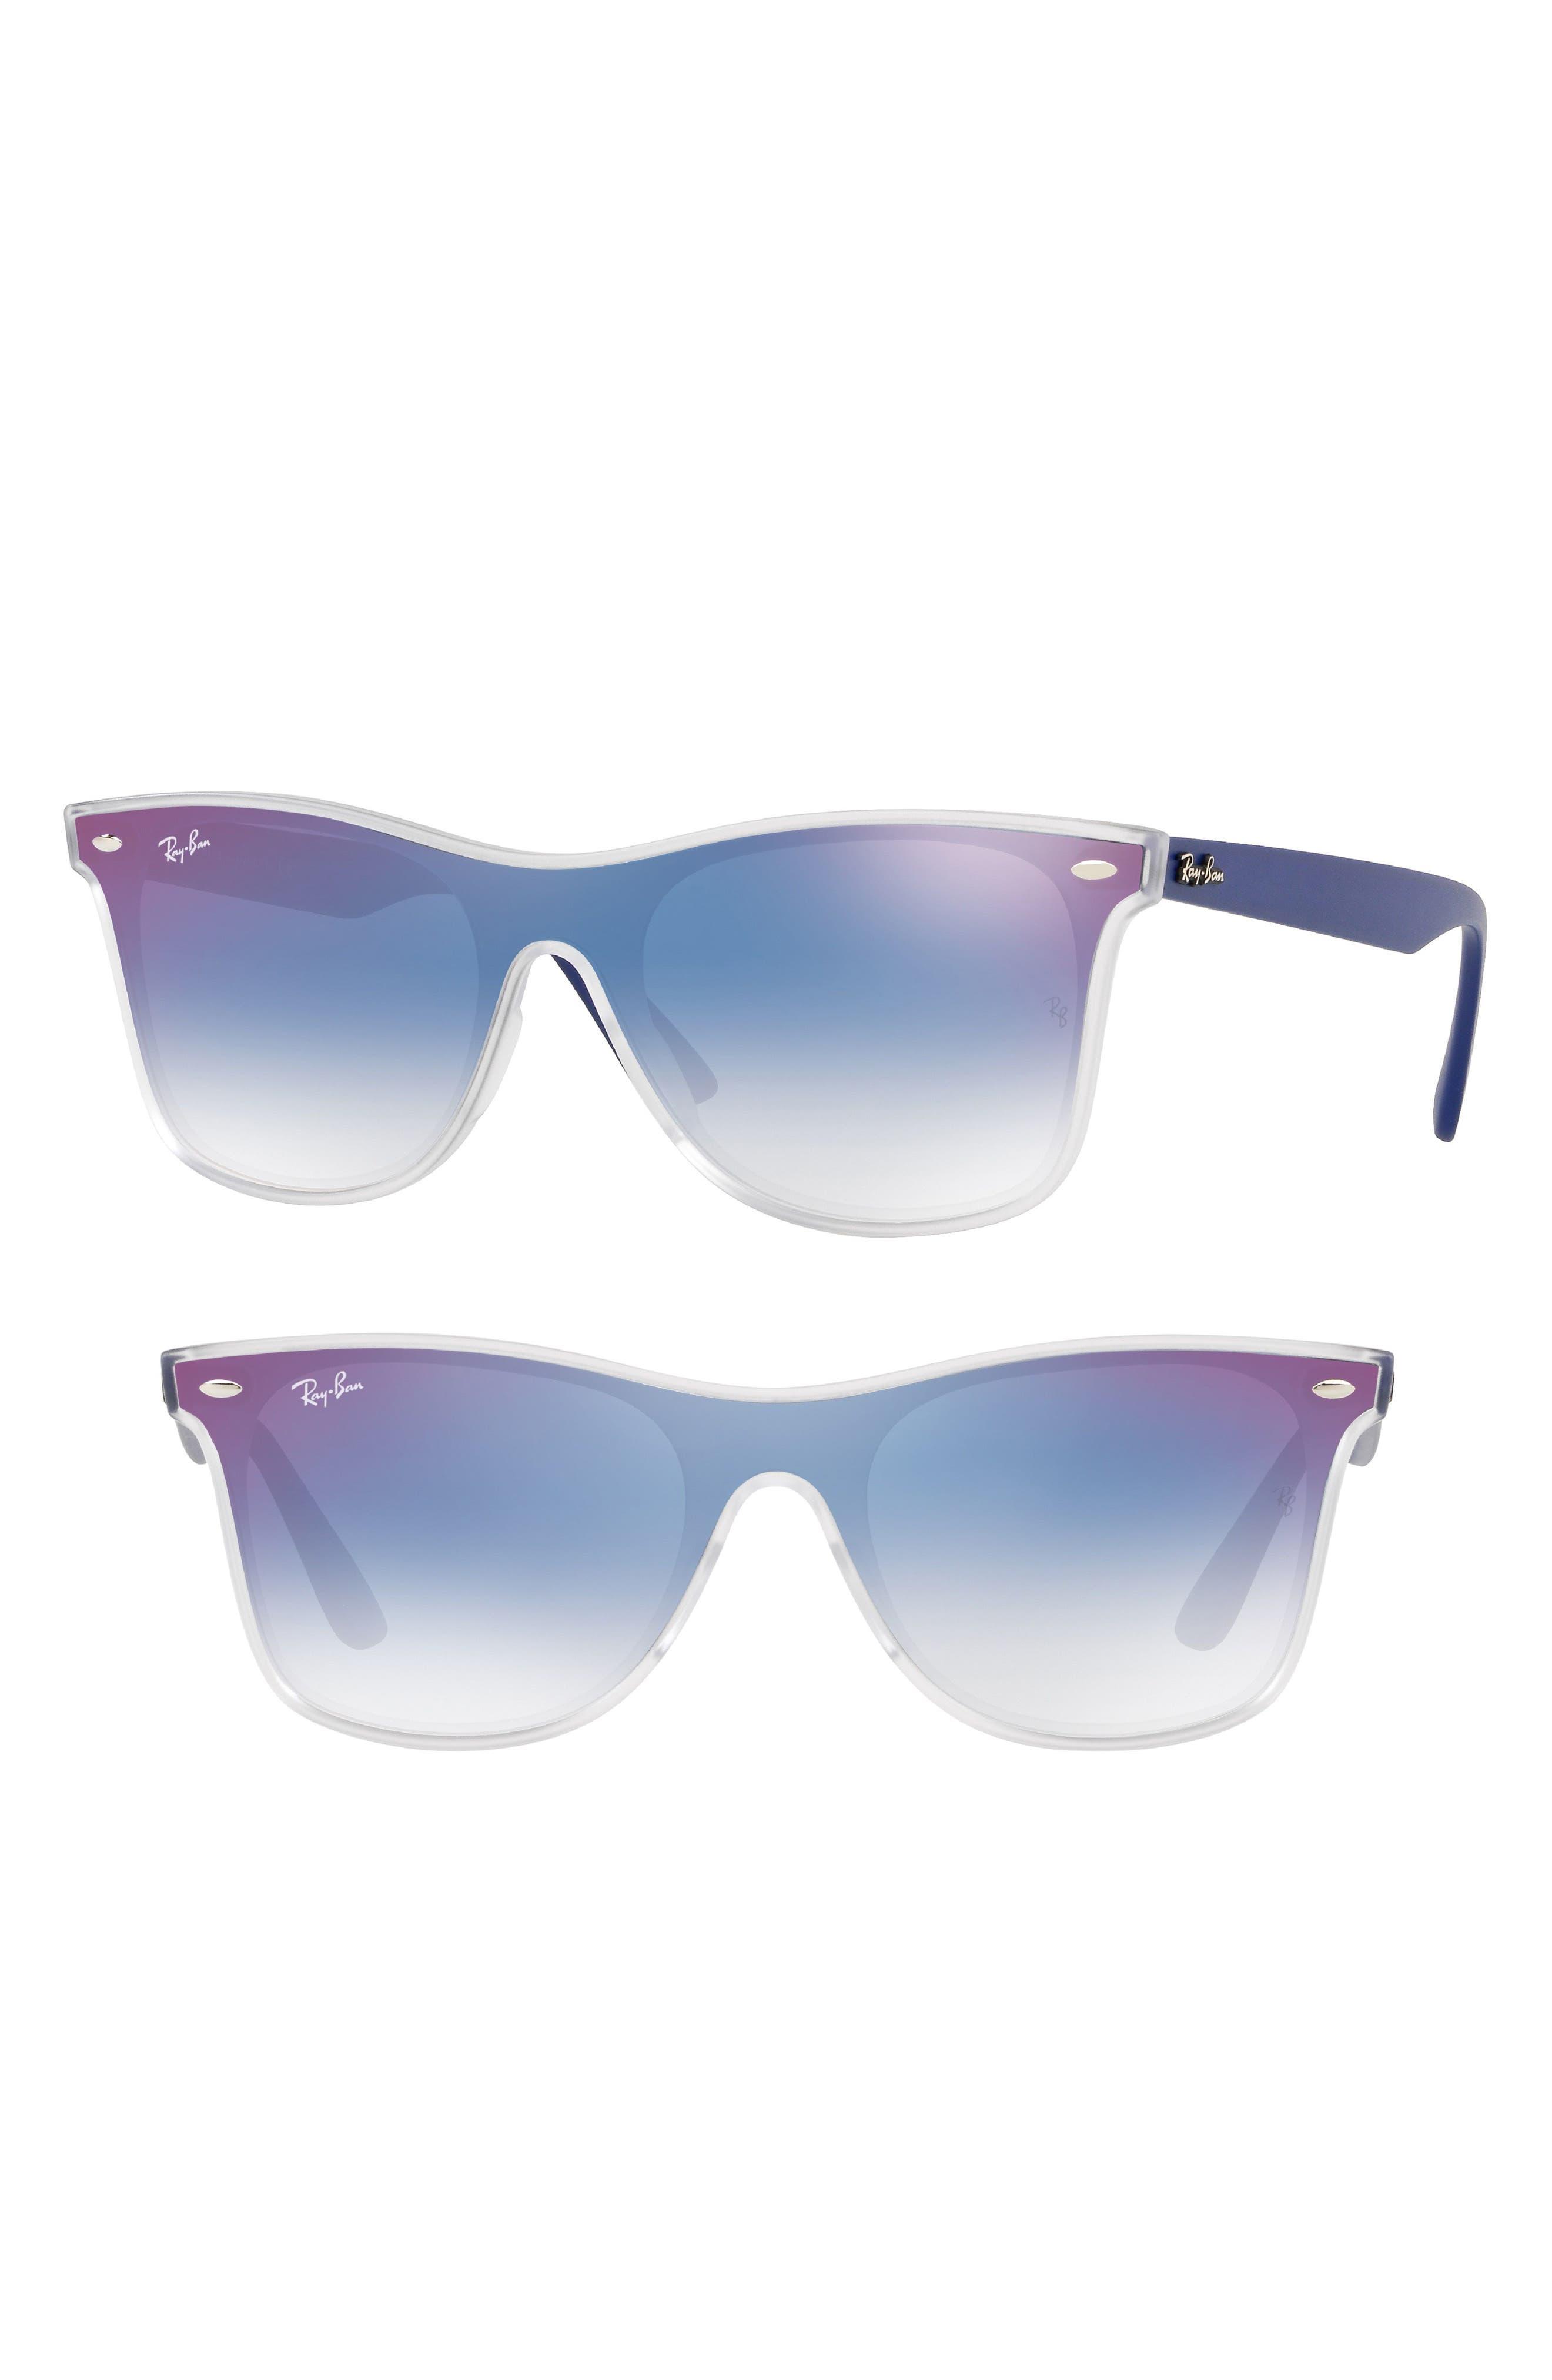 e5d938c14942b coupon code for ray ban polarized lenses peeling mask 3dfd6 348ba